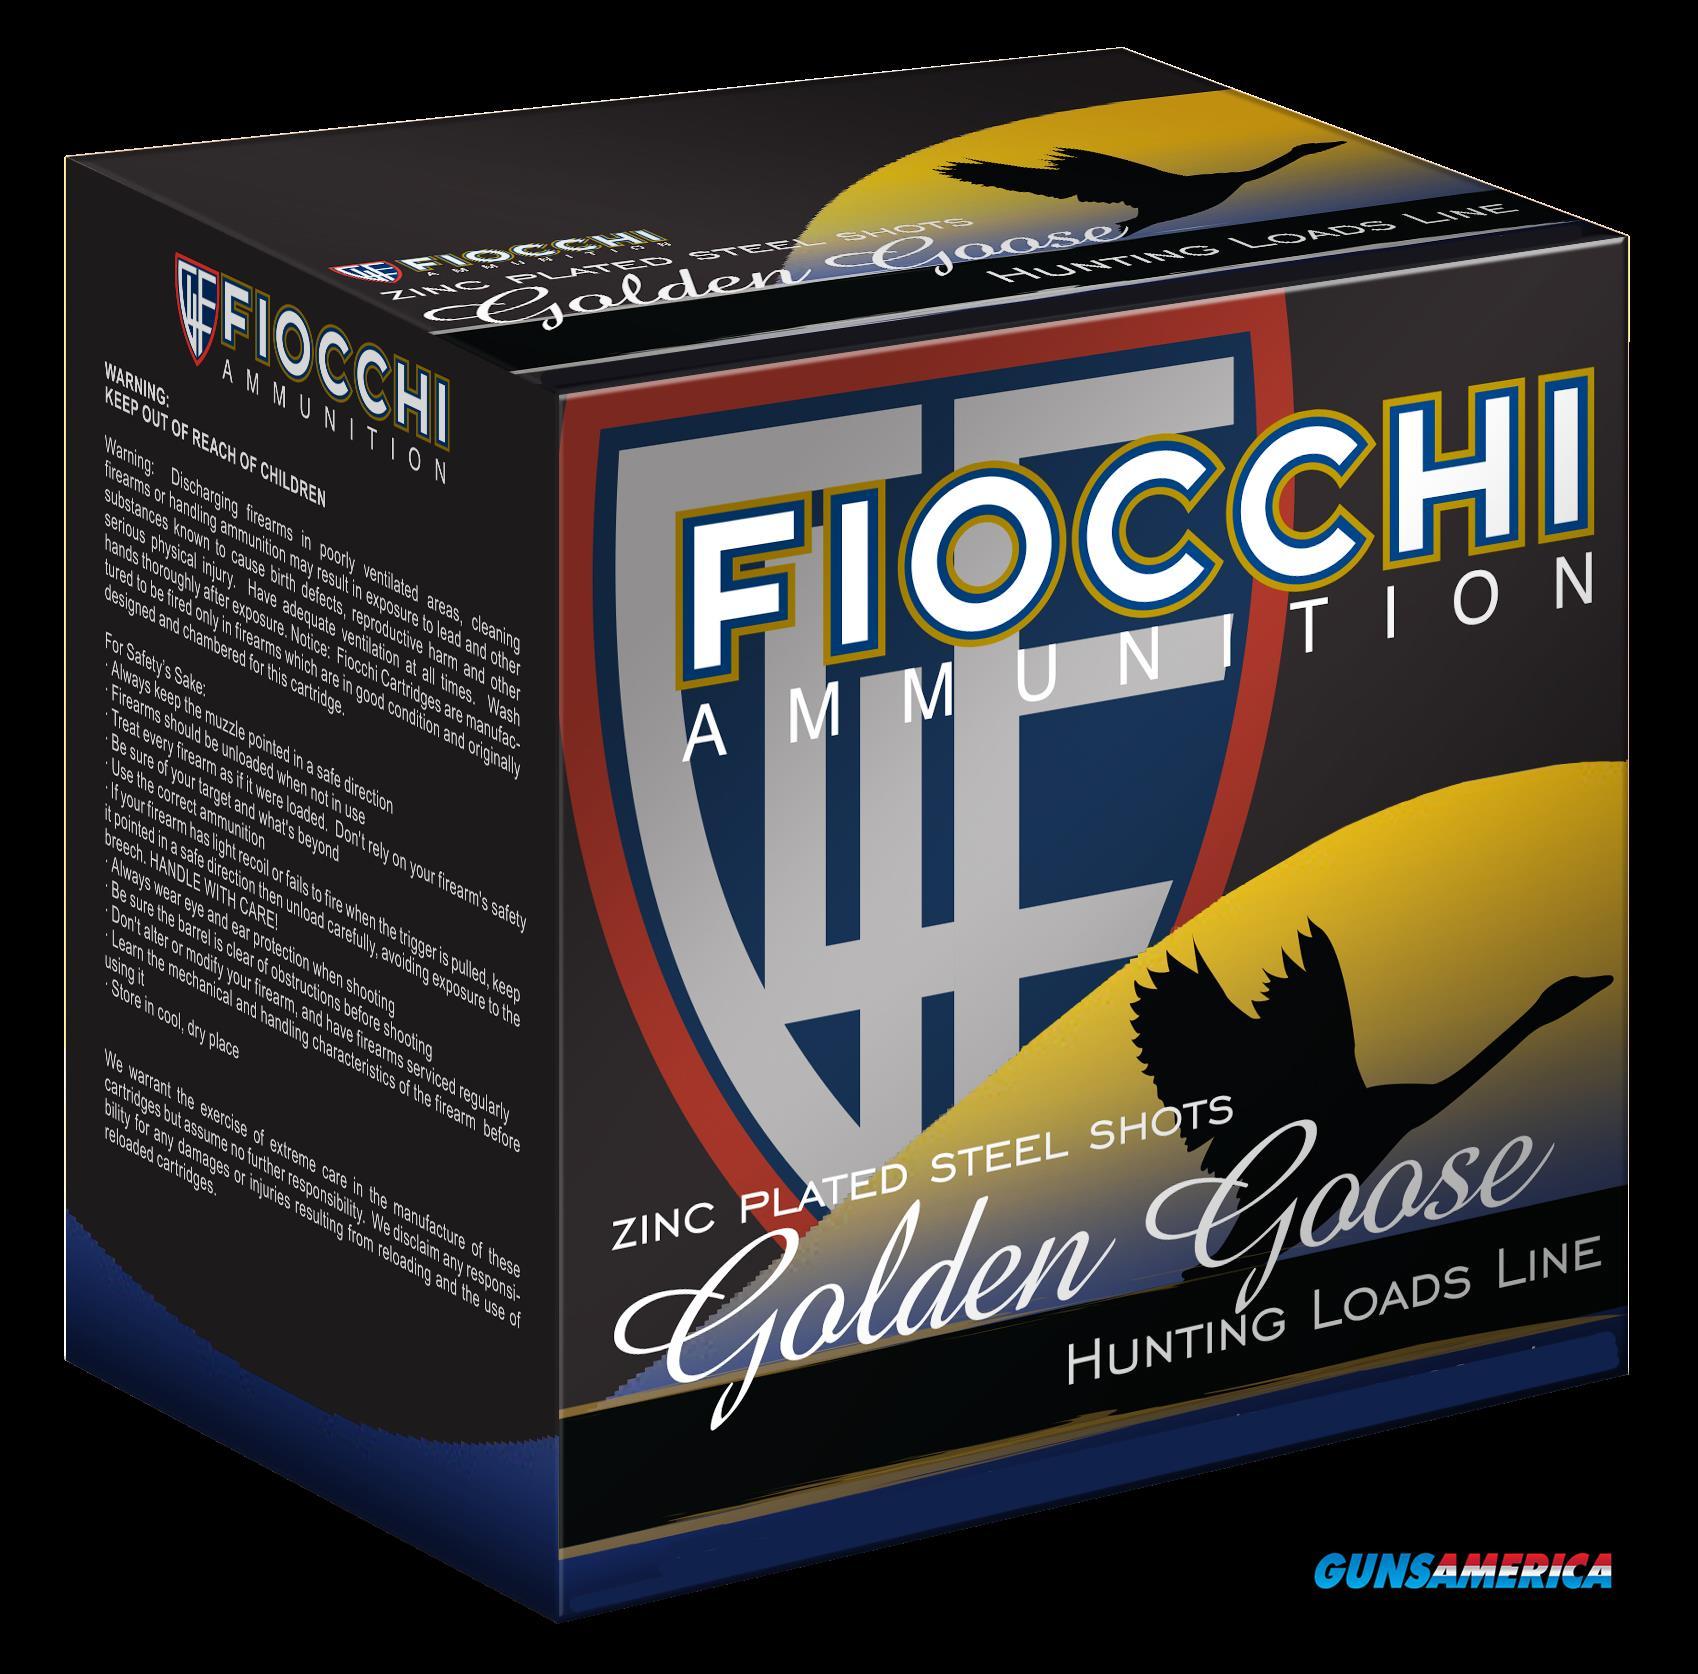 Fiocchi Extrema, Fio 1235ggt   Steel   T     15-8  25-10  Guns > Pistols > 1911 Pistol Copies (non-Colt)